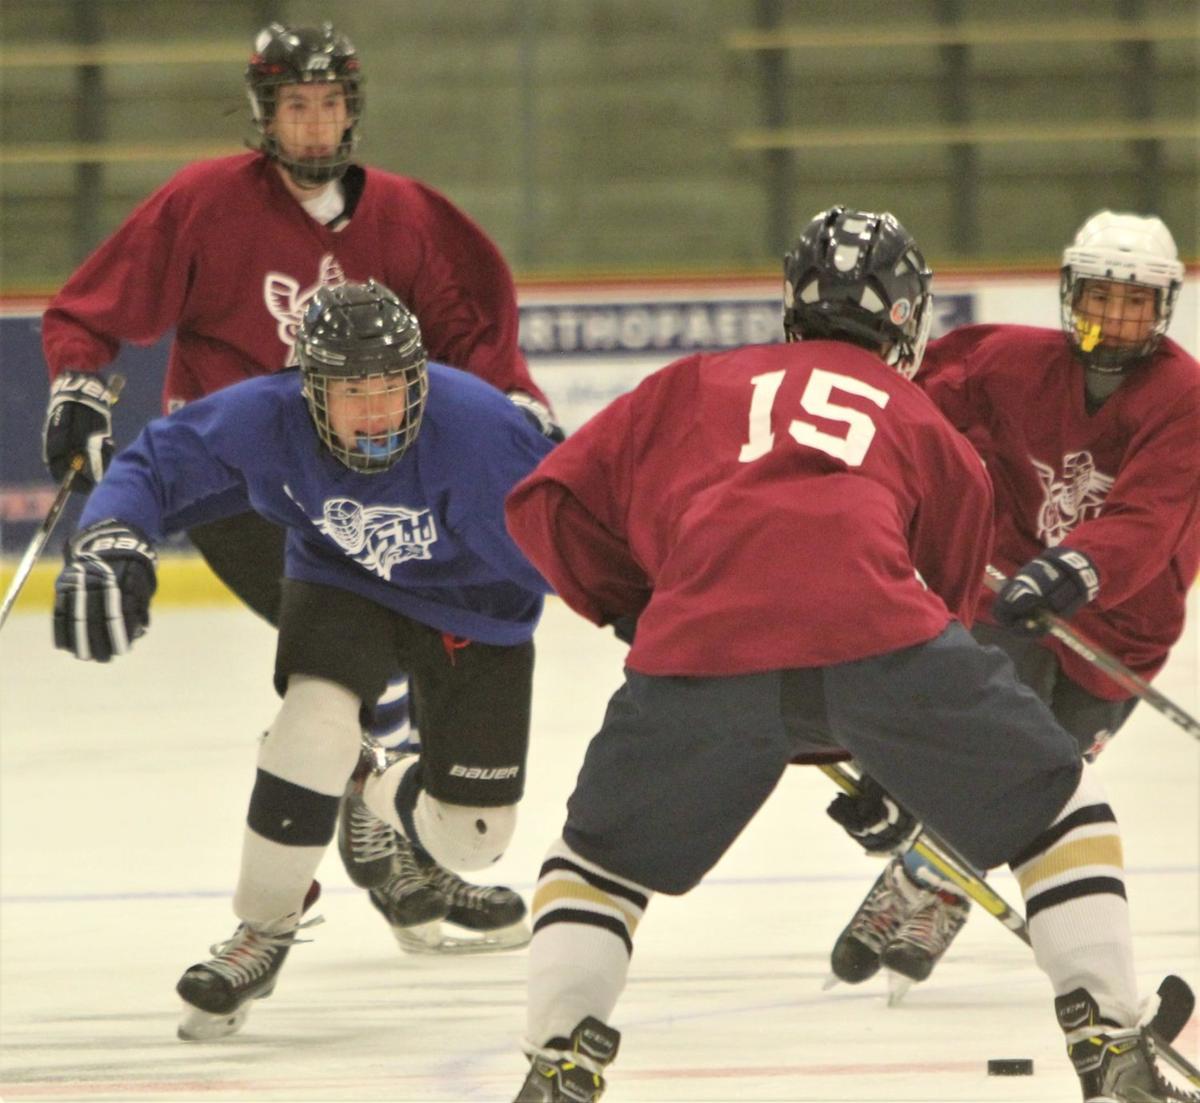 Cape Cod Summer Hockey — August 19, 2019